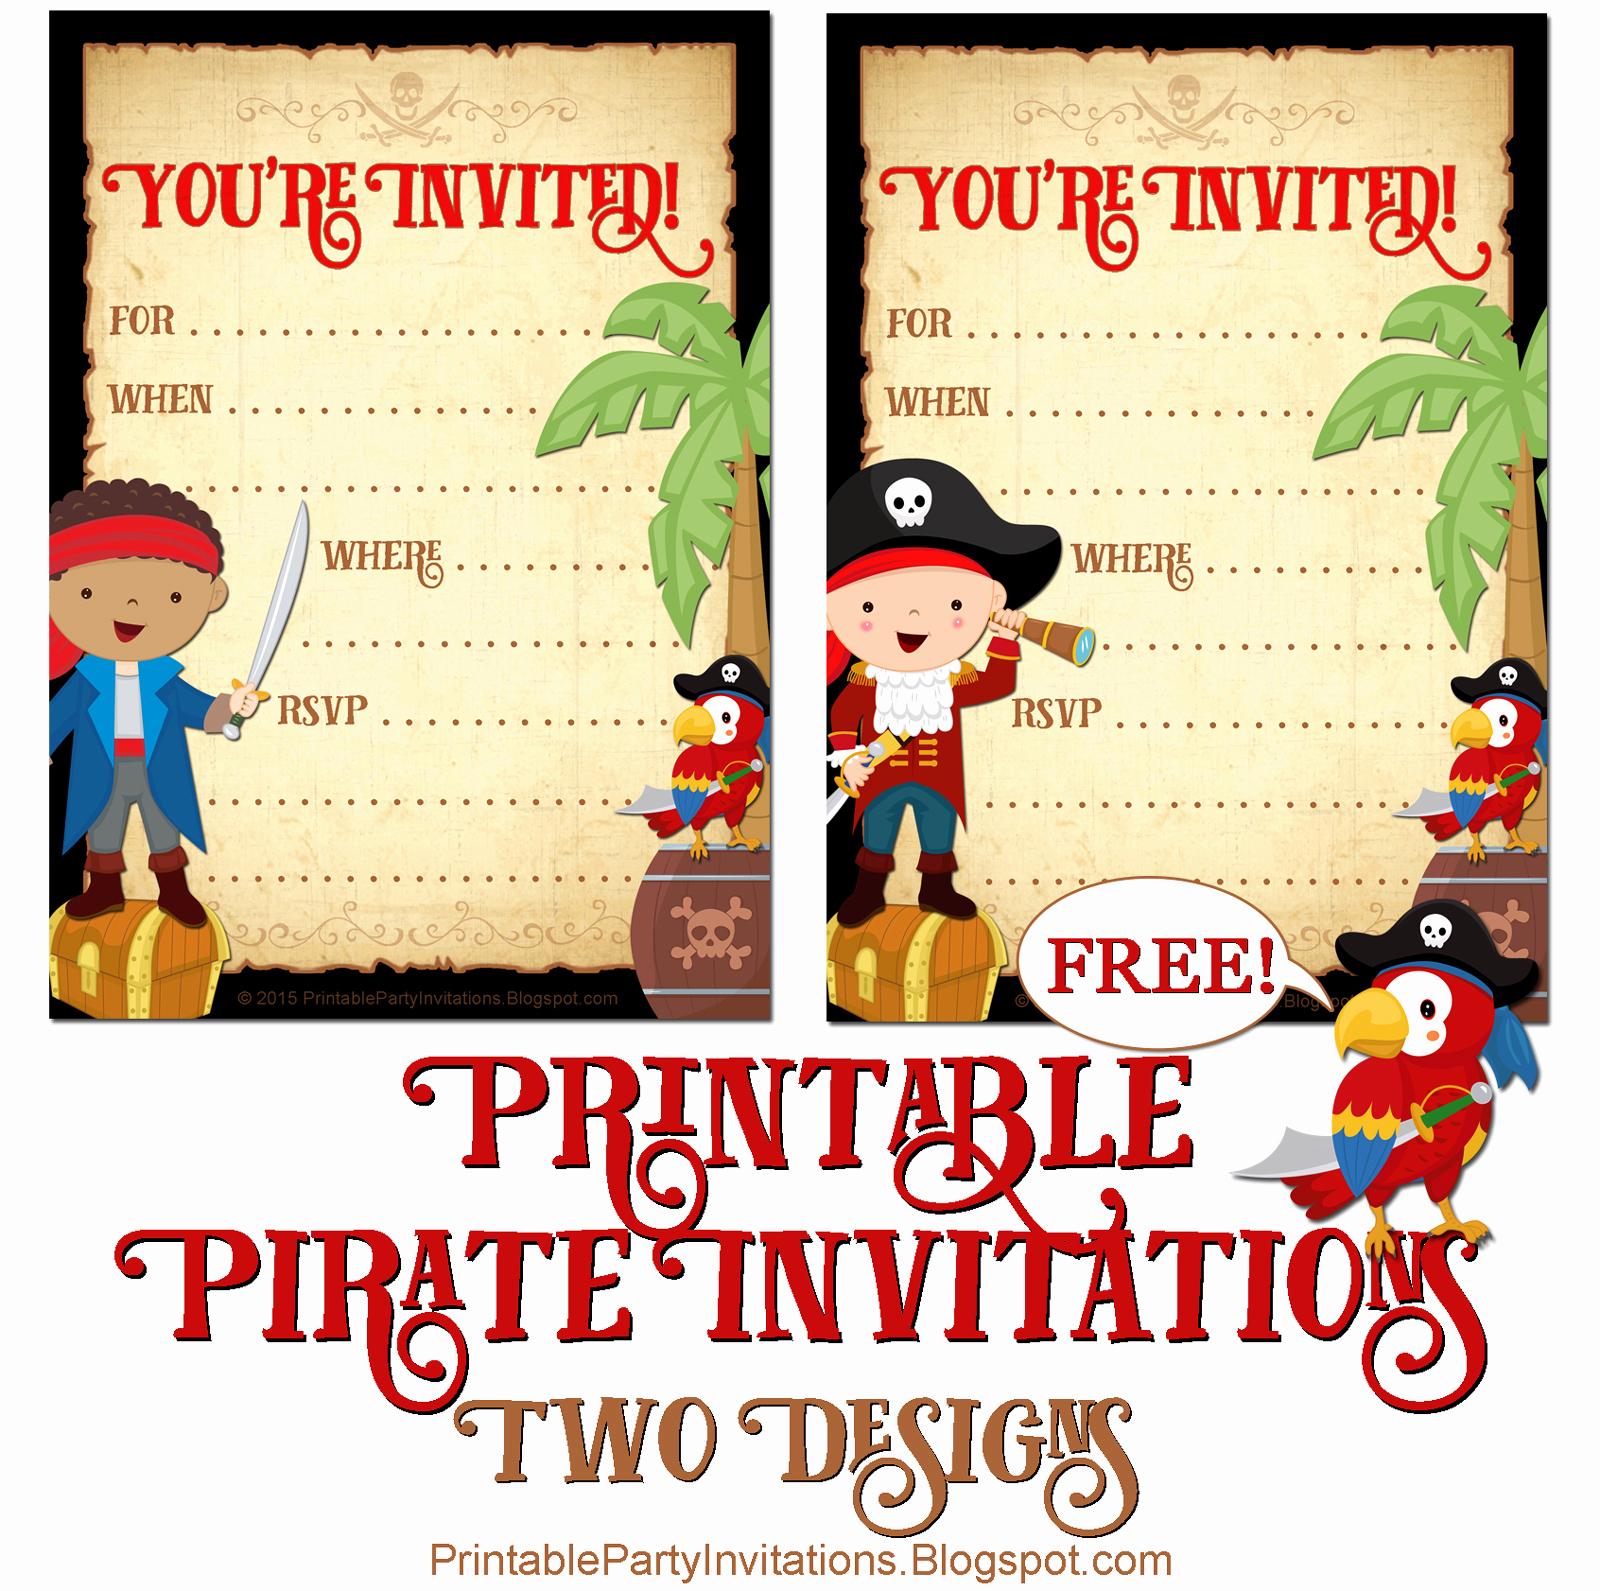 Free Pirate Invitation Template Inspirational Free Printable Pirate Invite Template